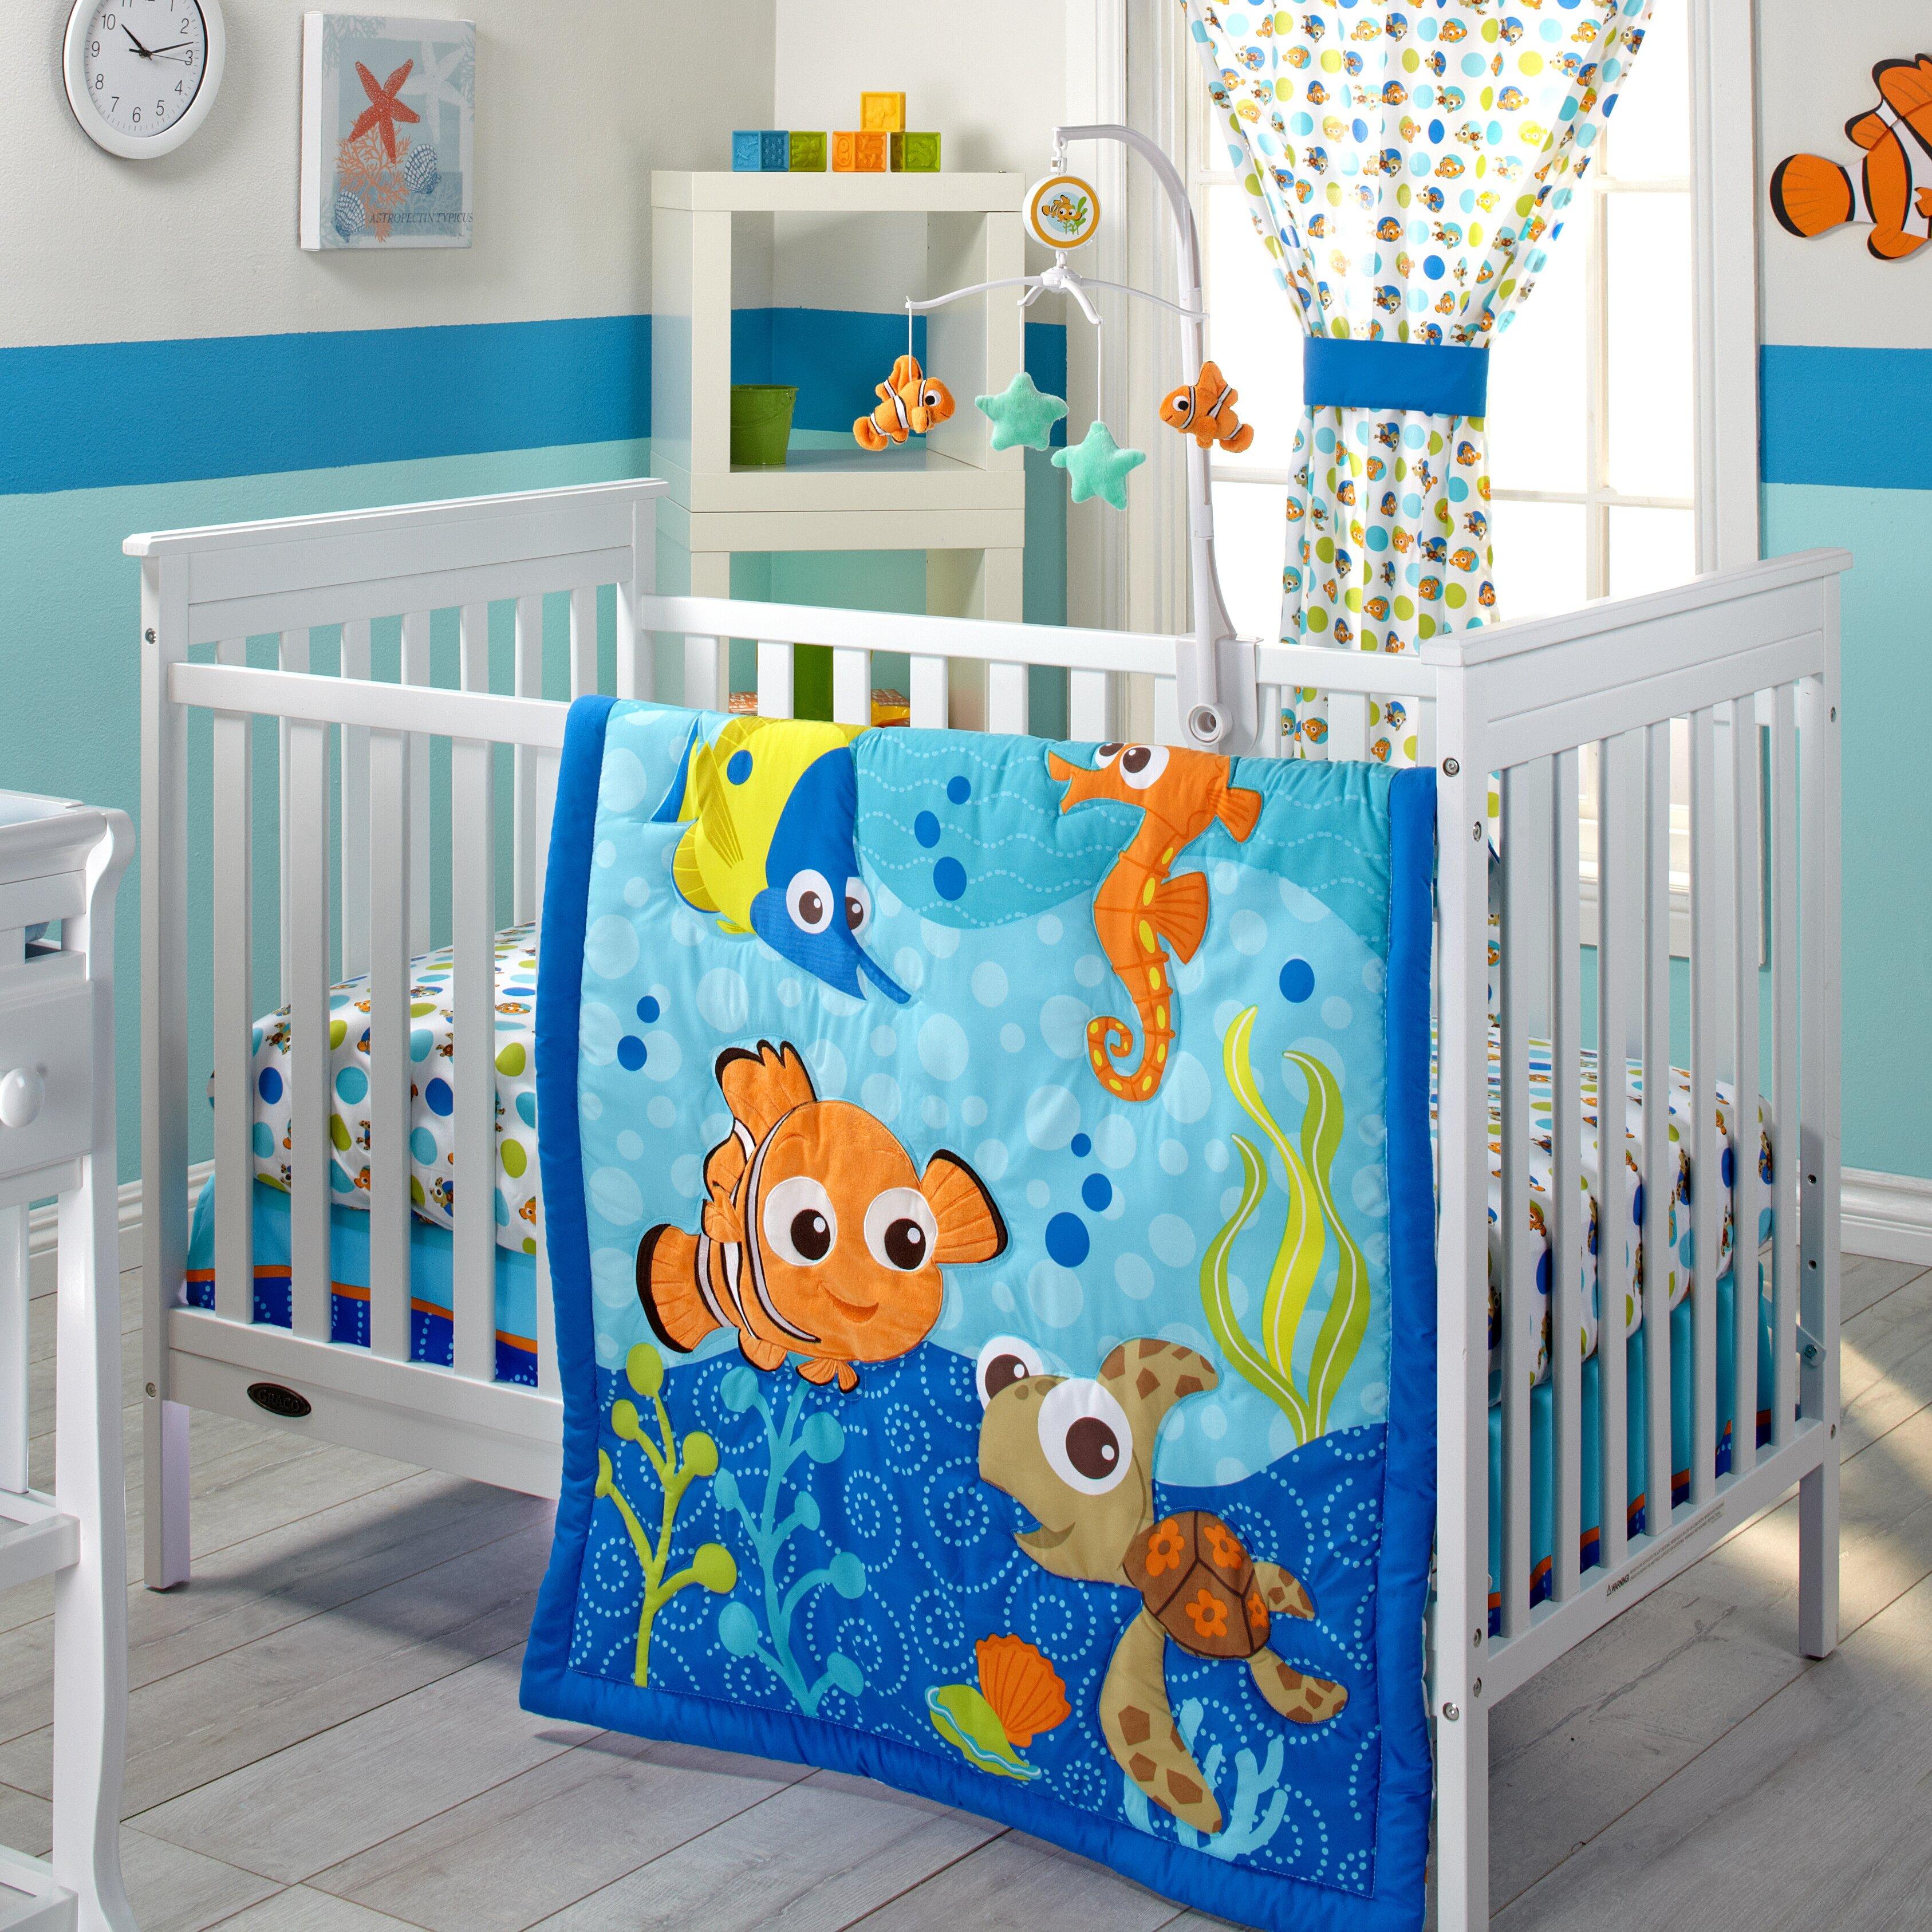 Baby cribs bedding sets - Disney Baby Nemo 3 Piece Crib Bedding Set